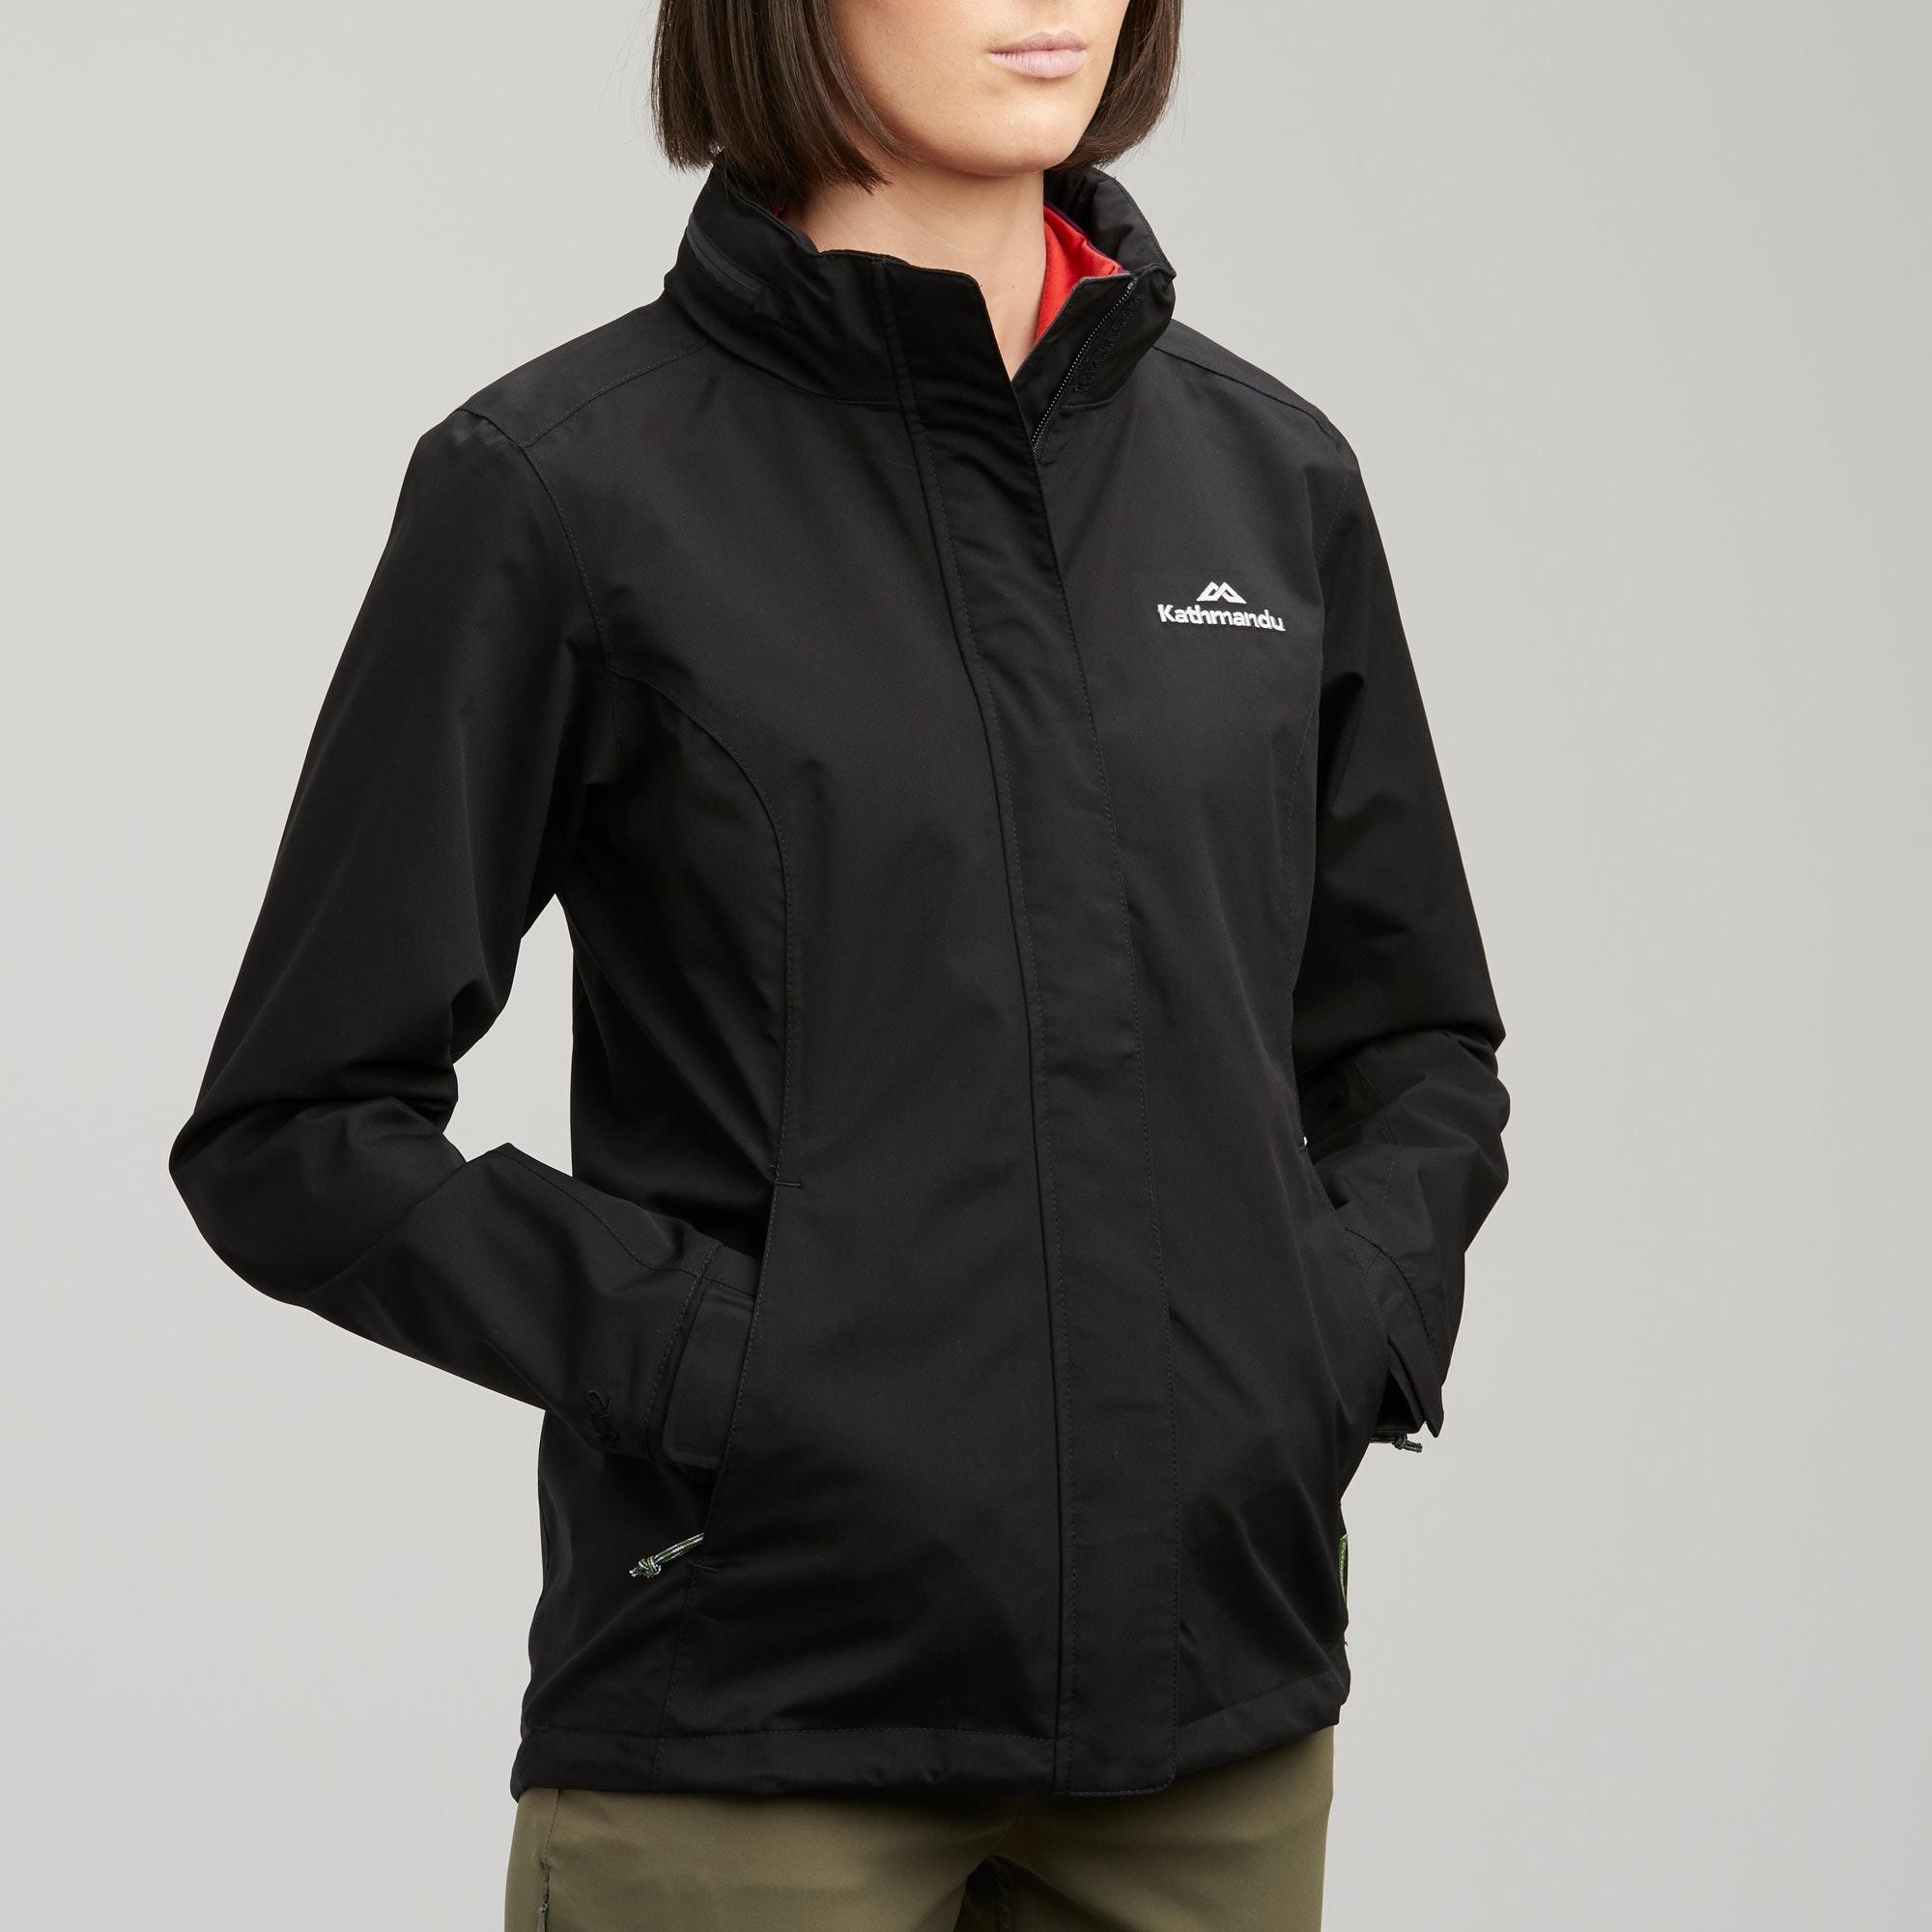 Kathmandu-Andulo-Womens-2-Layer-Windproof-Waterproof-Outdoor-Hiking-Rain-Jacket thumbnail 10